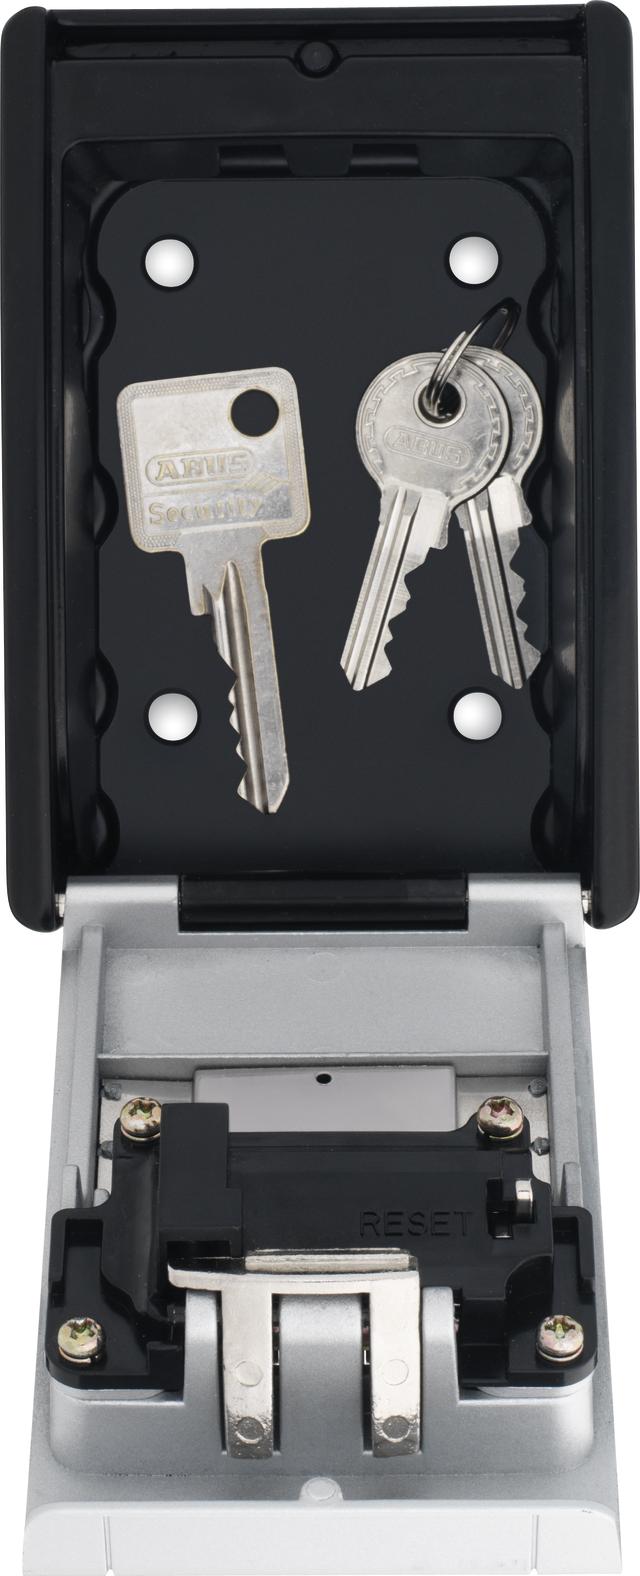 KeyGarage™ 787 with keys